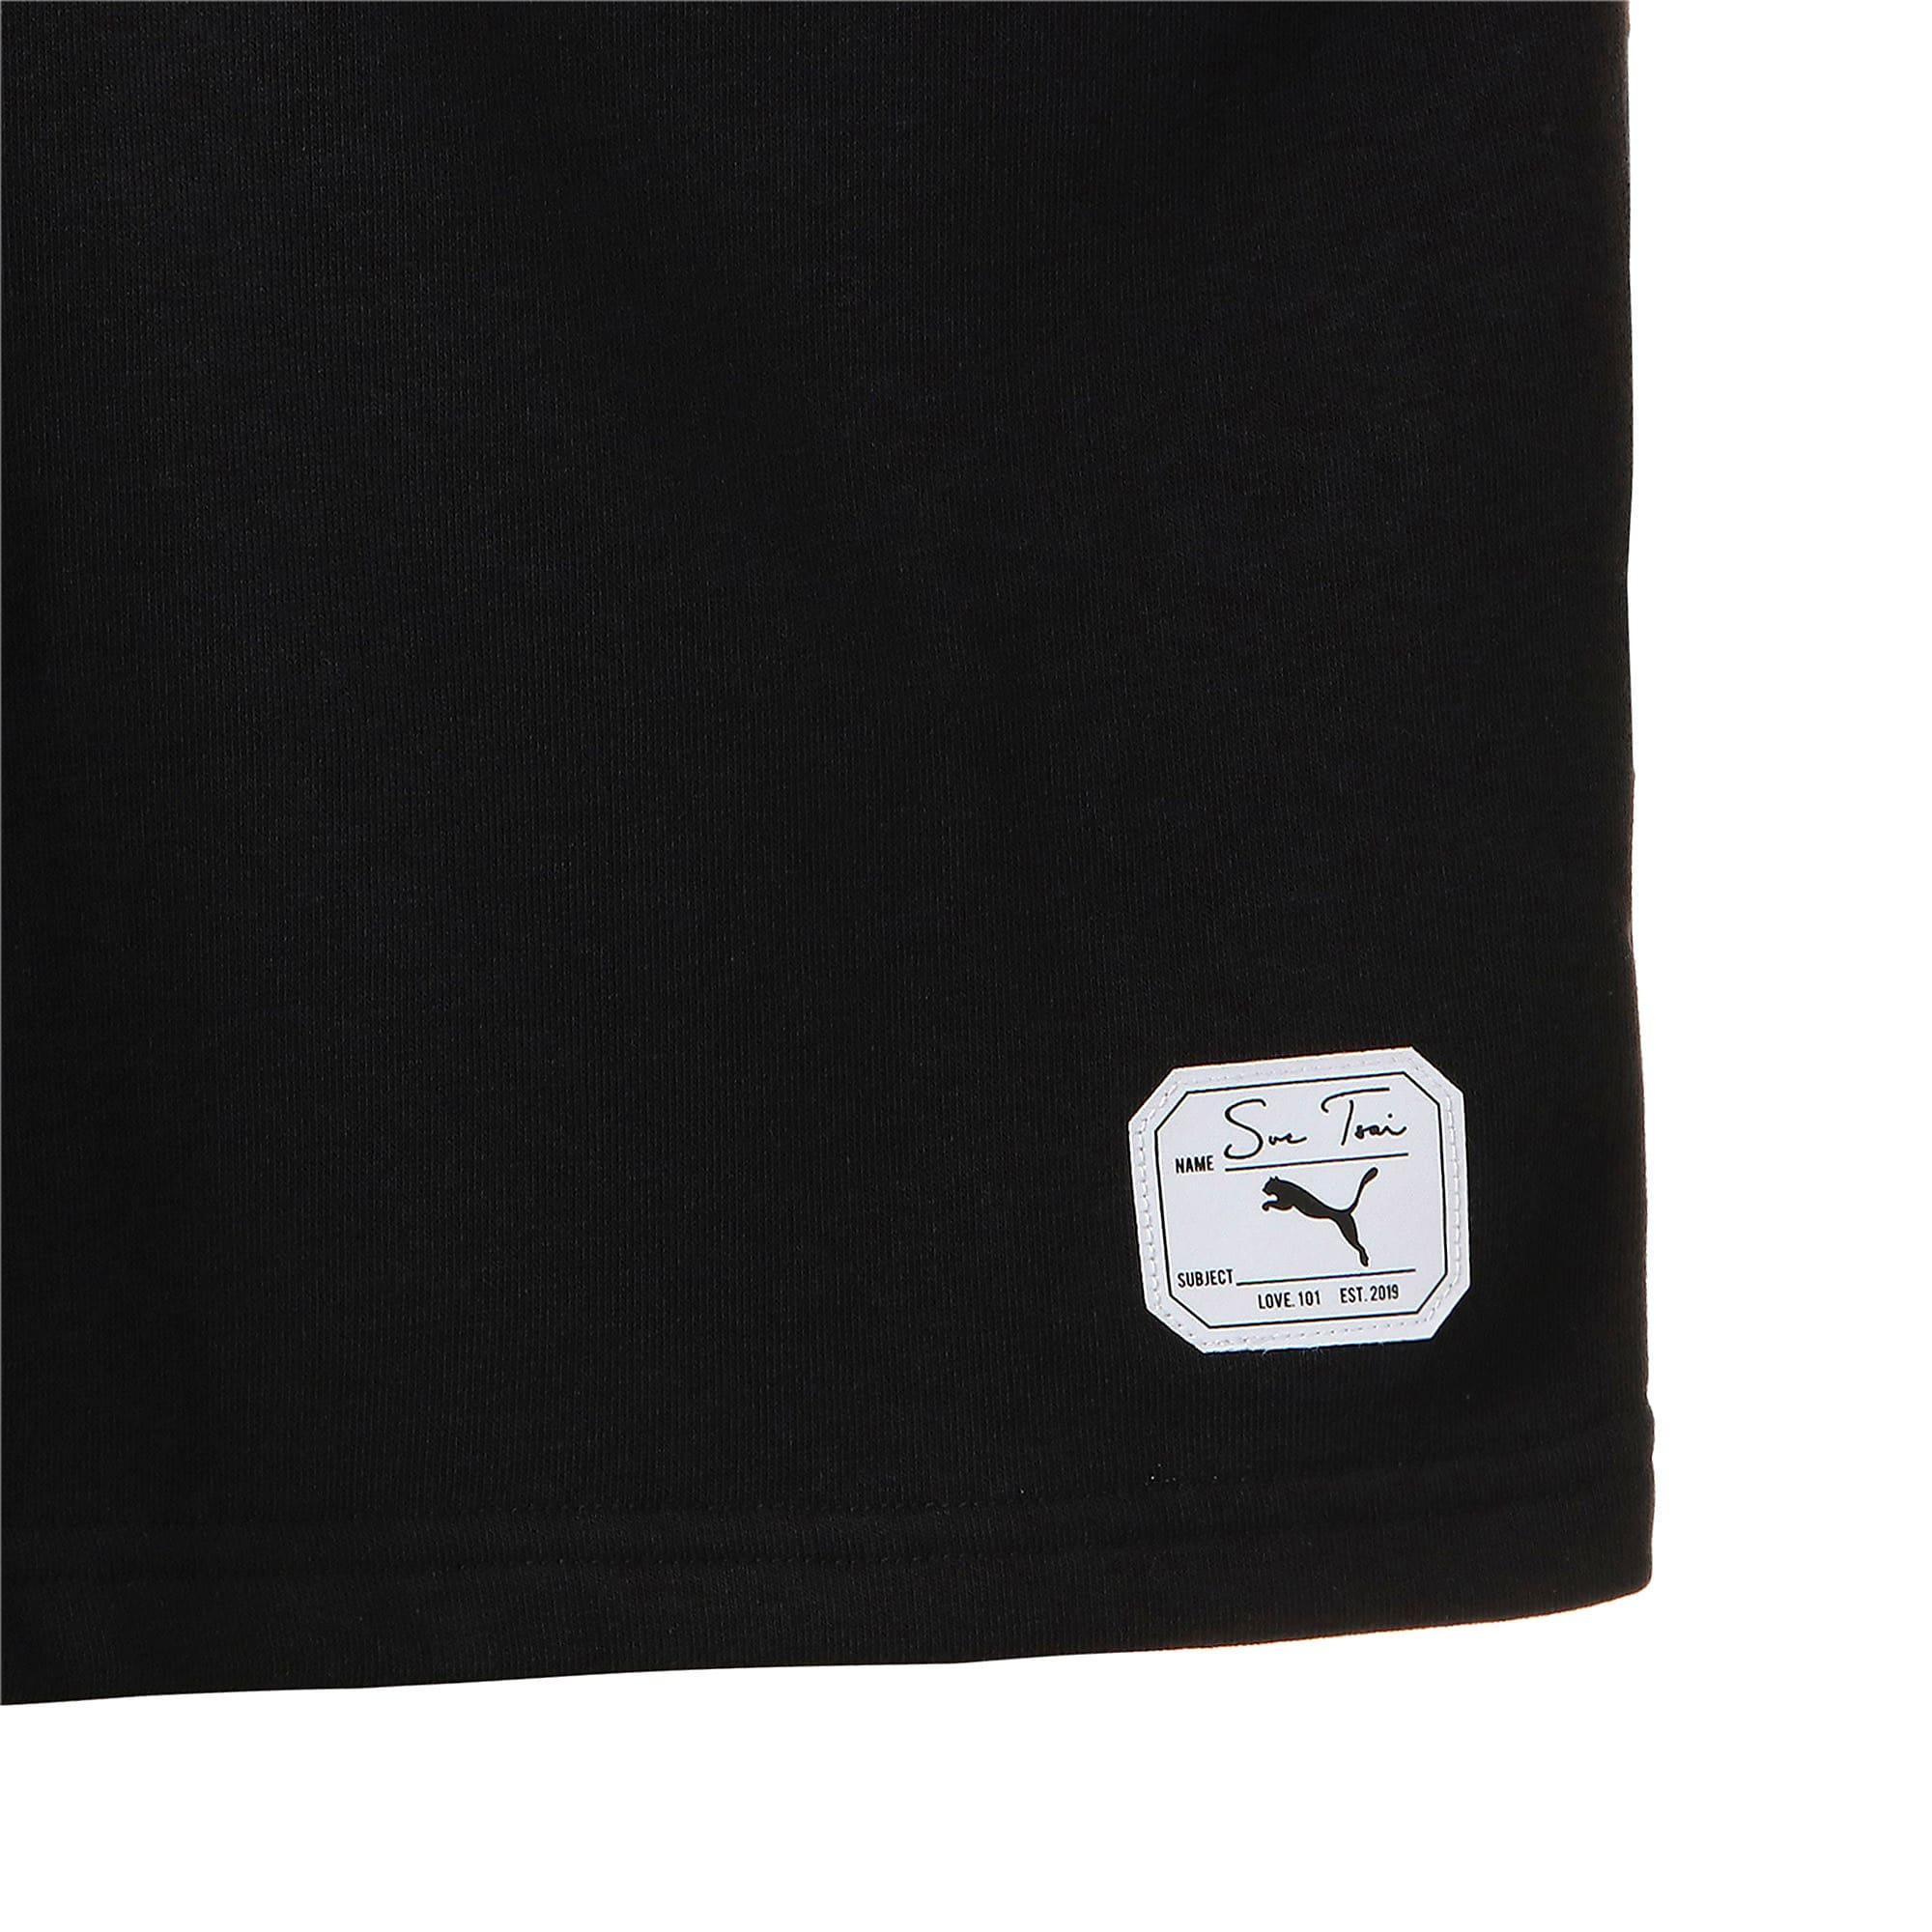 Thumbnail 6 of PUMA x SUE TSAI ウィメンズ Vネック セーター, Puma Black, medium-JPN